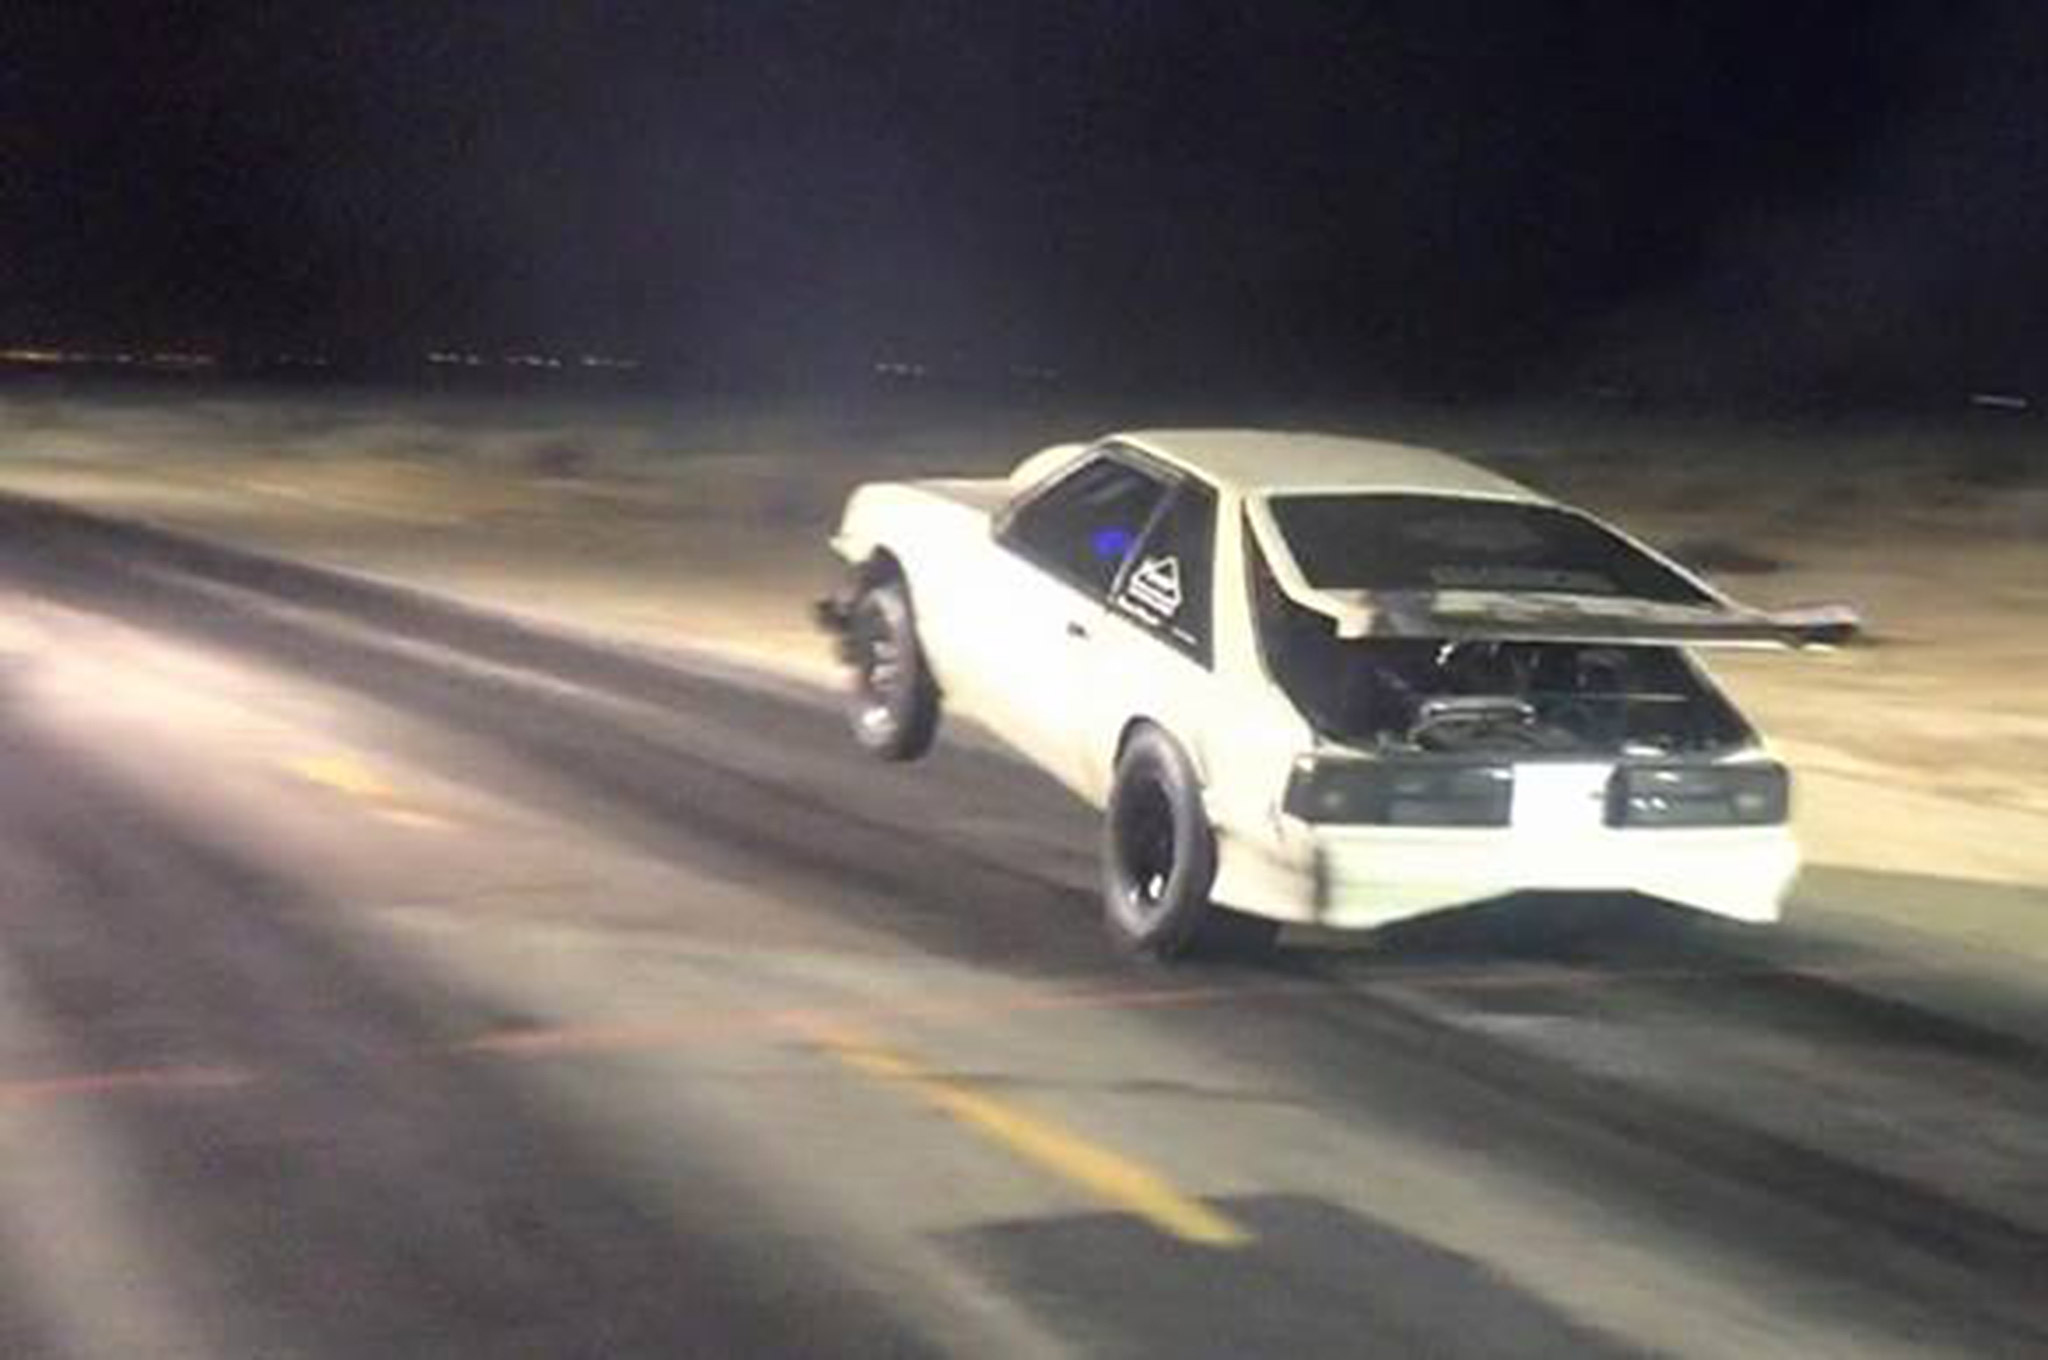 West Coast Street Outlaws Preparing To Film Race Wheelie